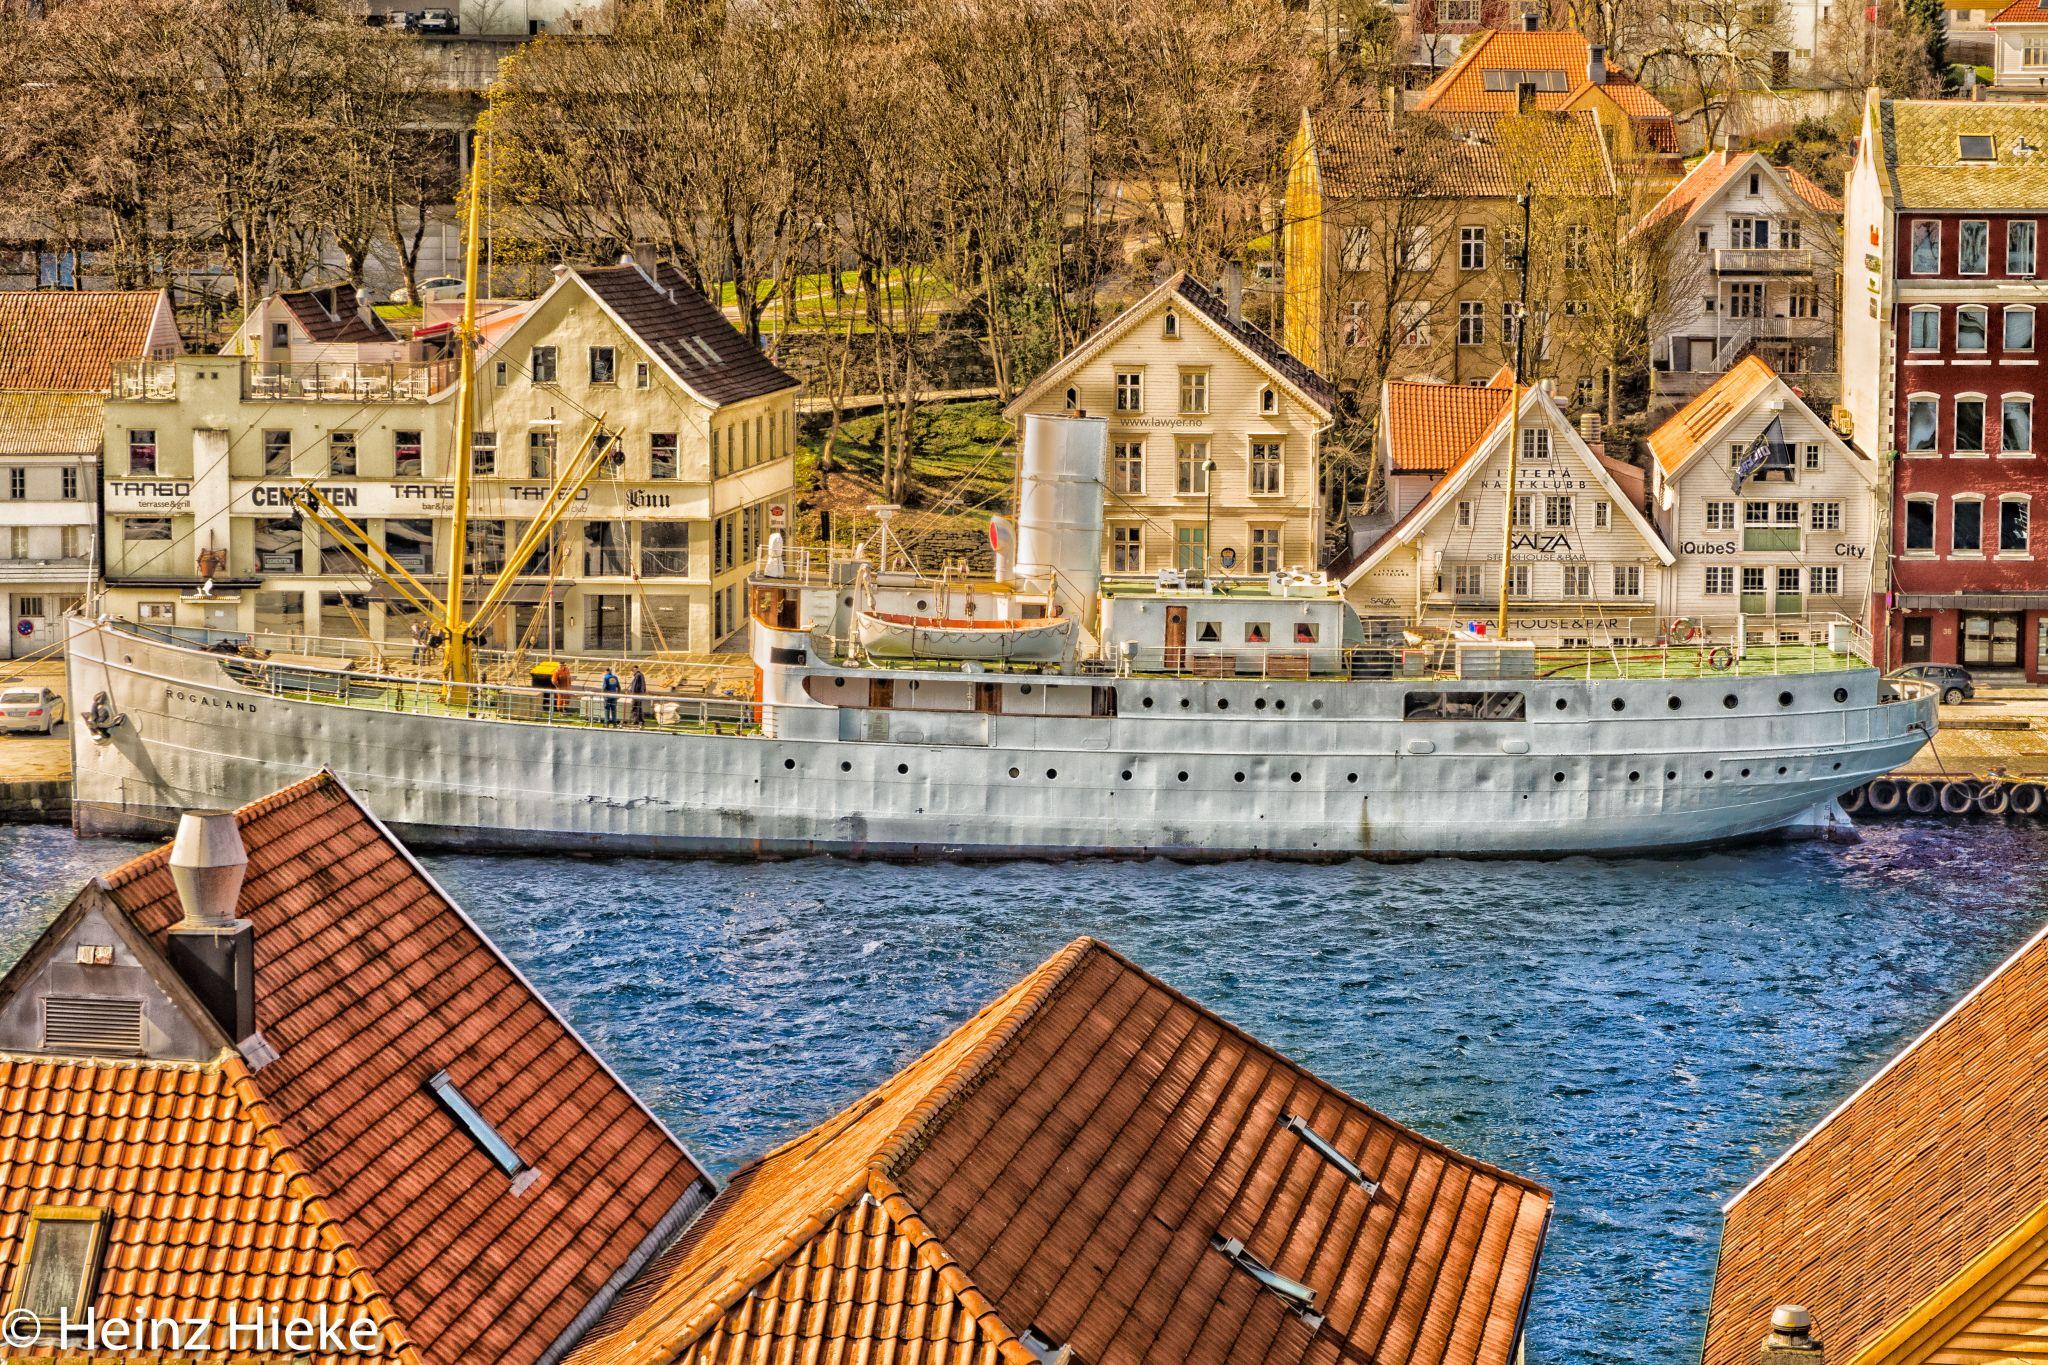 Valbergtårnet, Norway